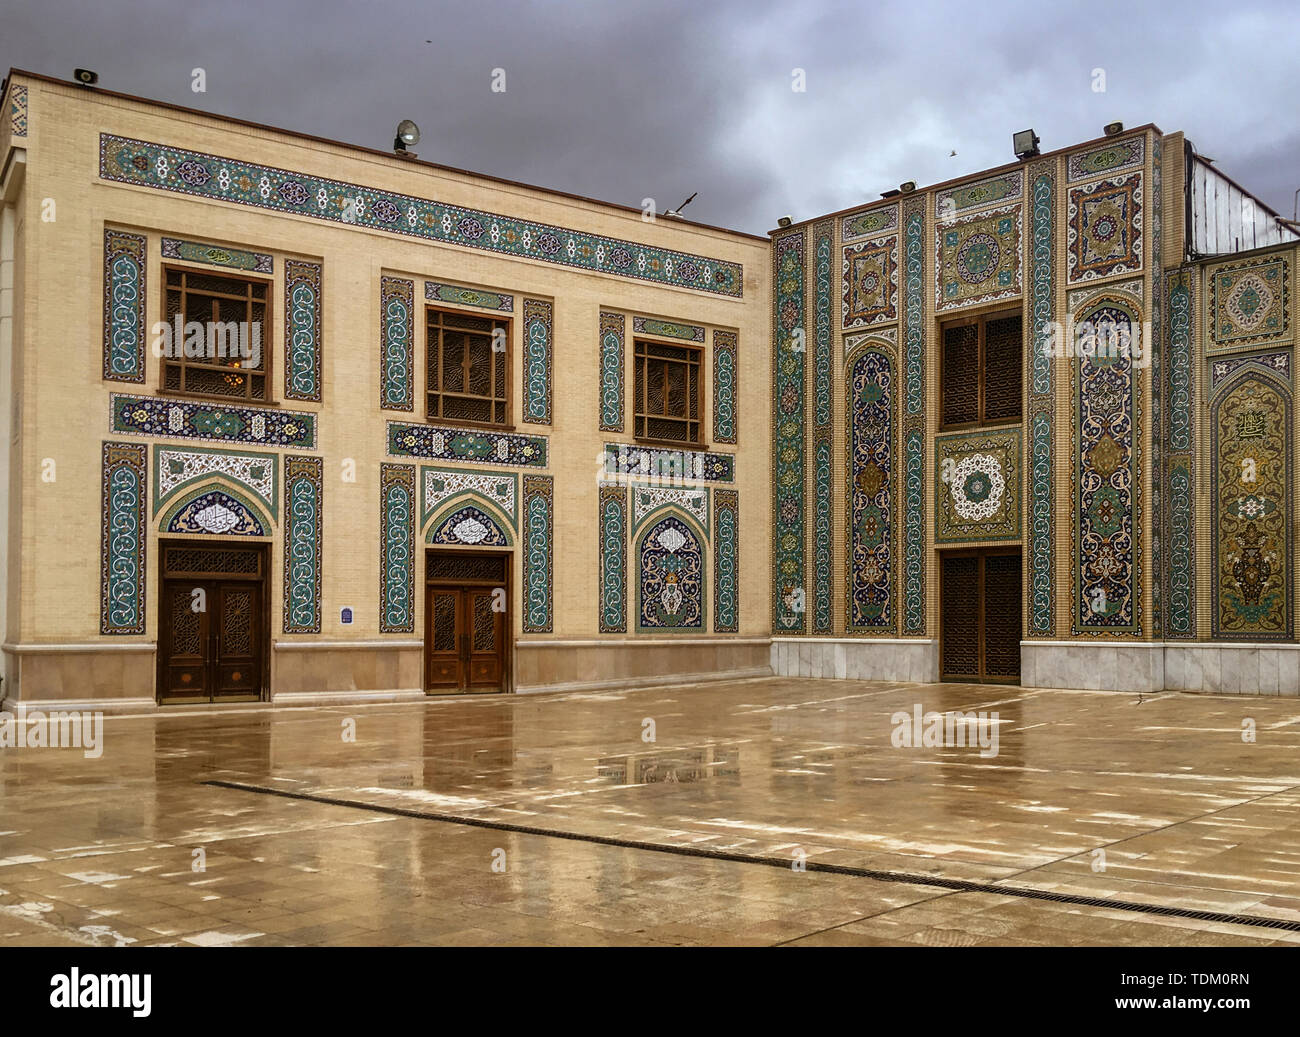 holy shrine of Shah Ceragh in Shiraz Iran. - Stock Image